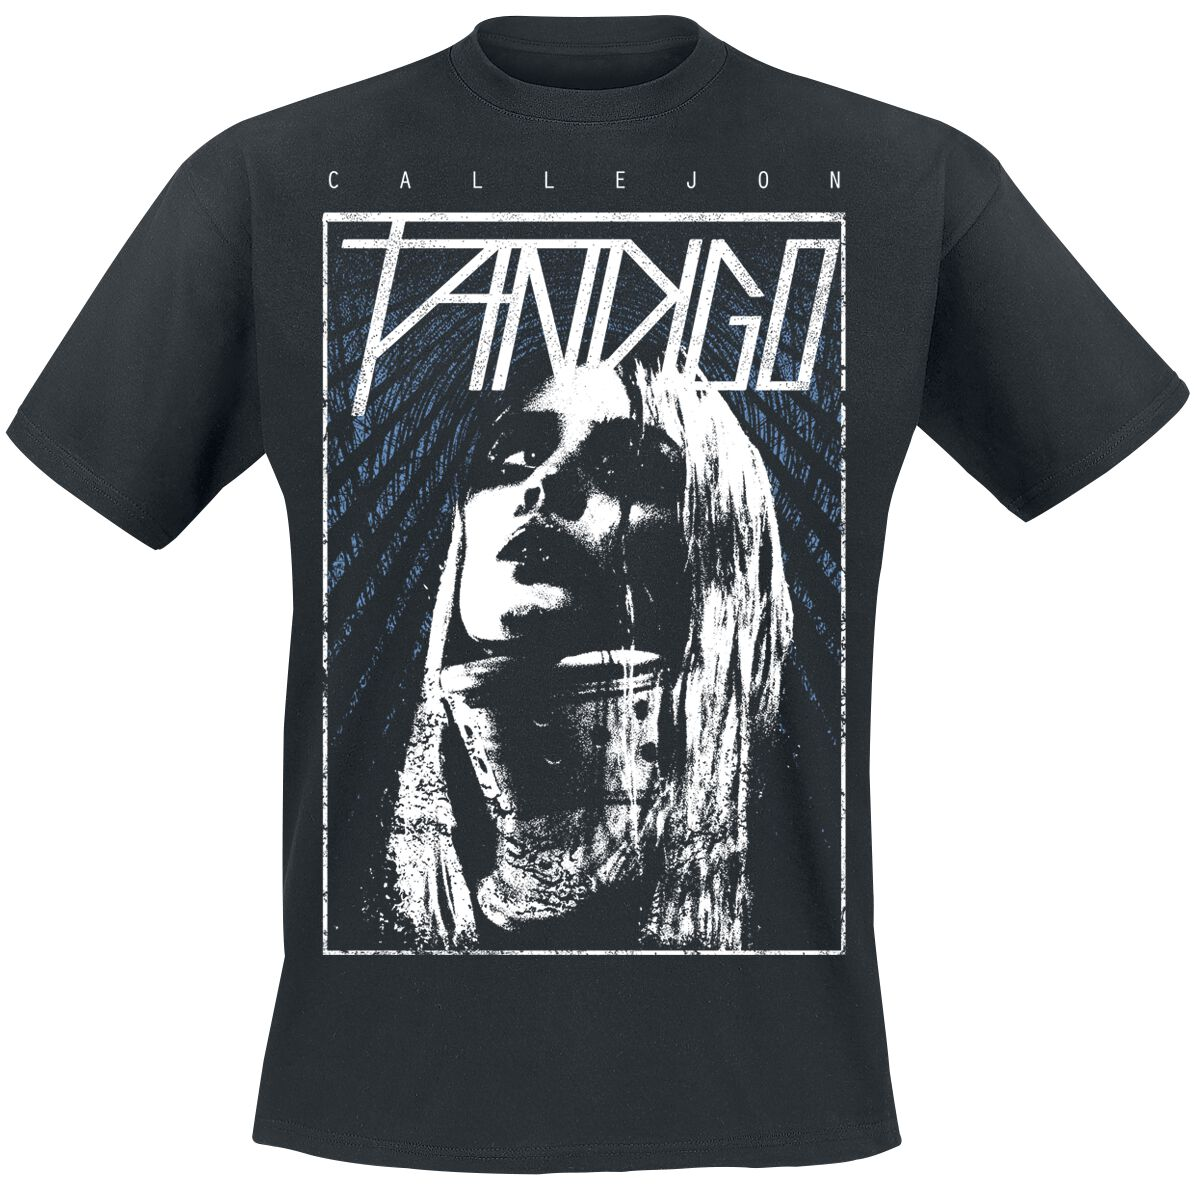 Zespoły - Koszulki - T-Shirt Callejon Fandigo Girl T-Shirt czarny - 362375